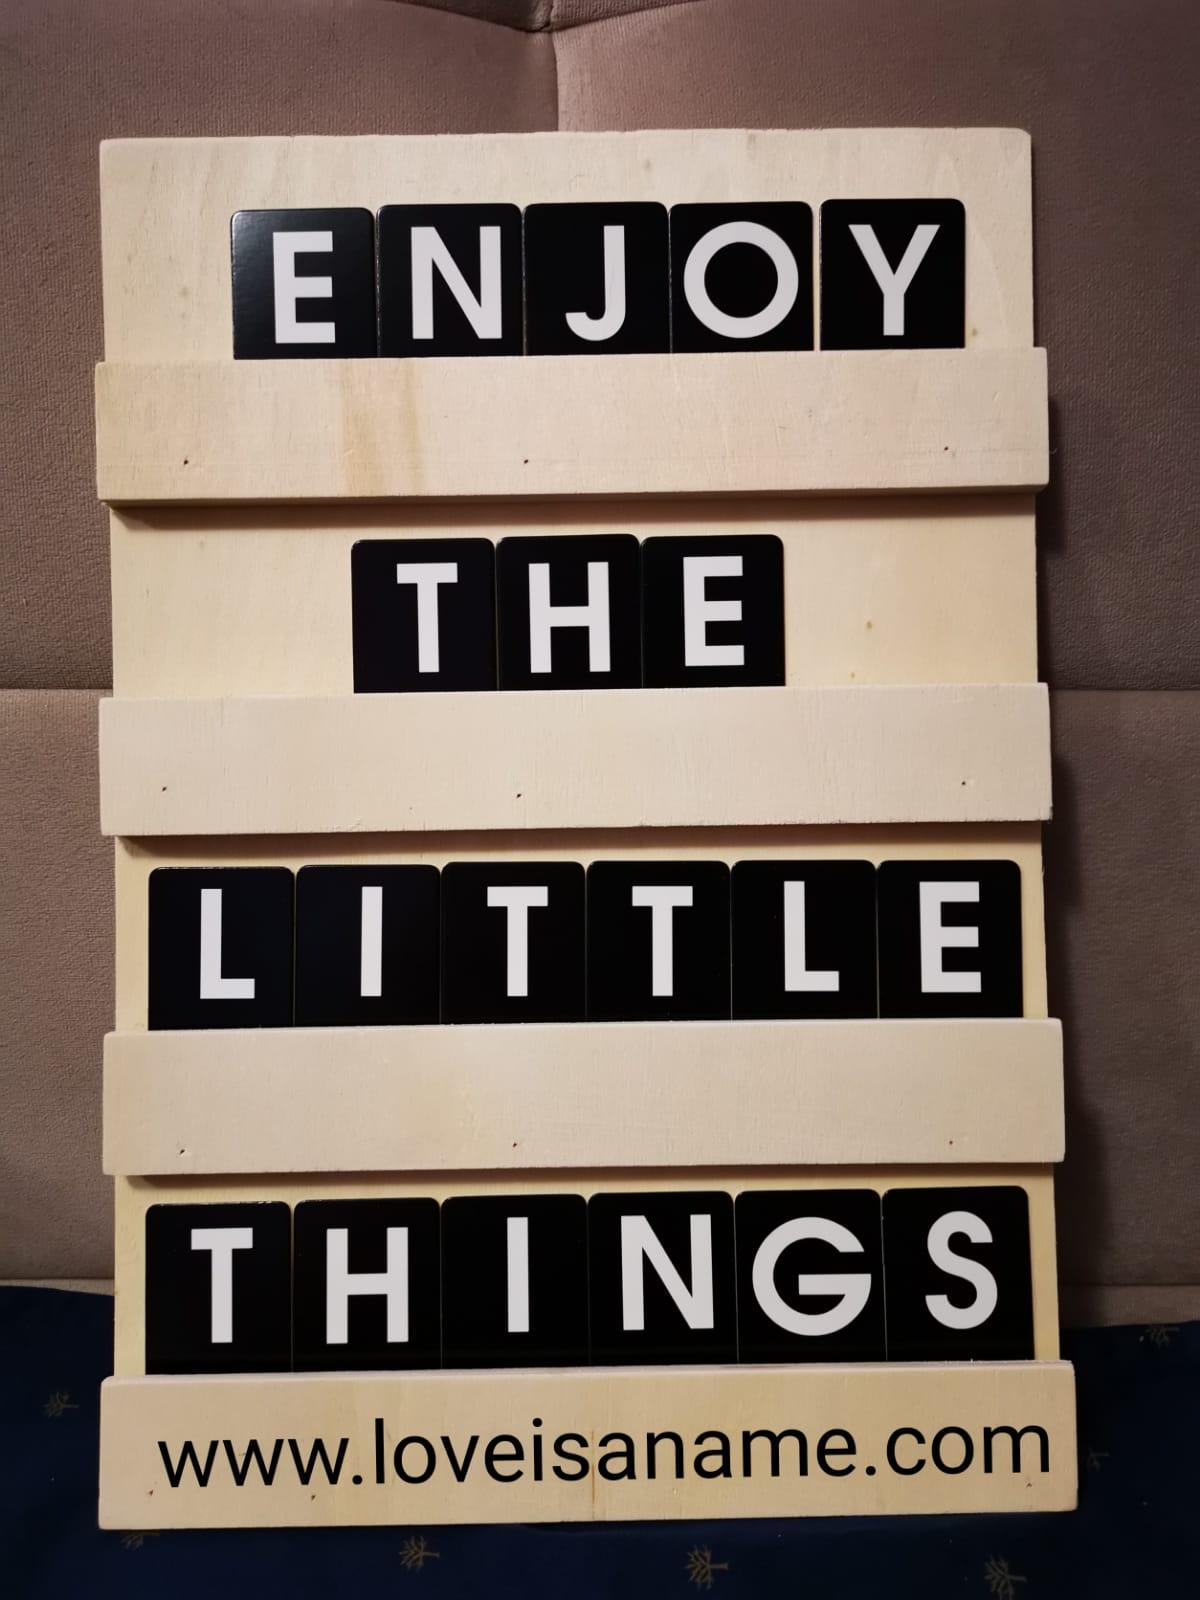 Enjoy-the-little-things - Loveisaname